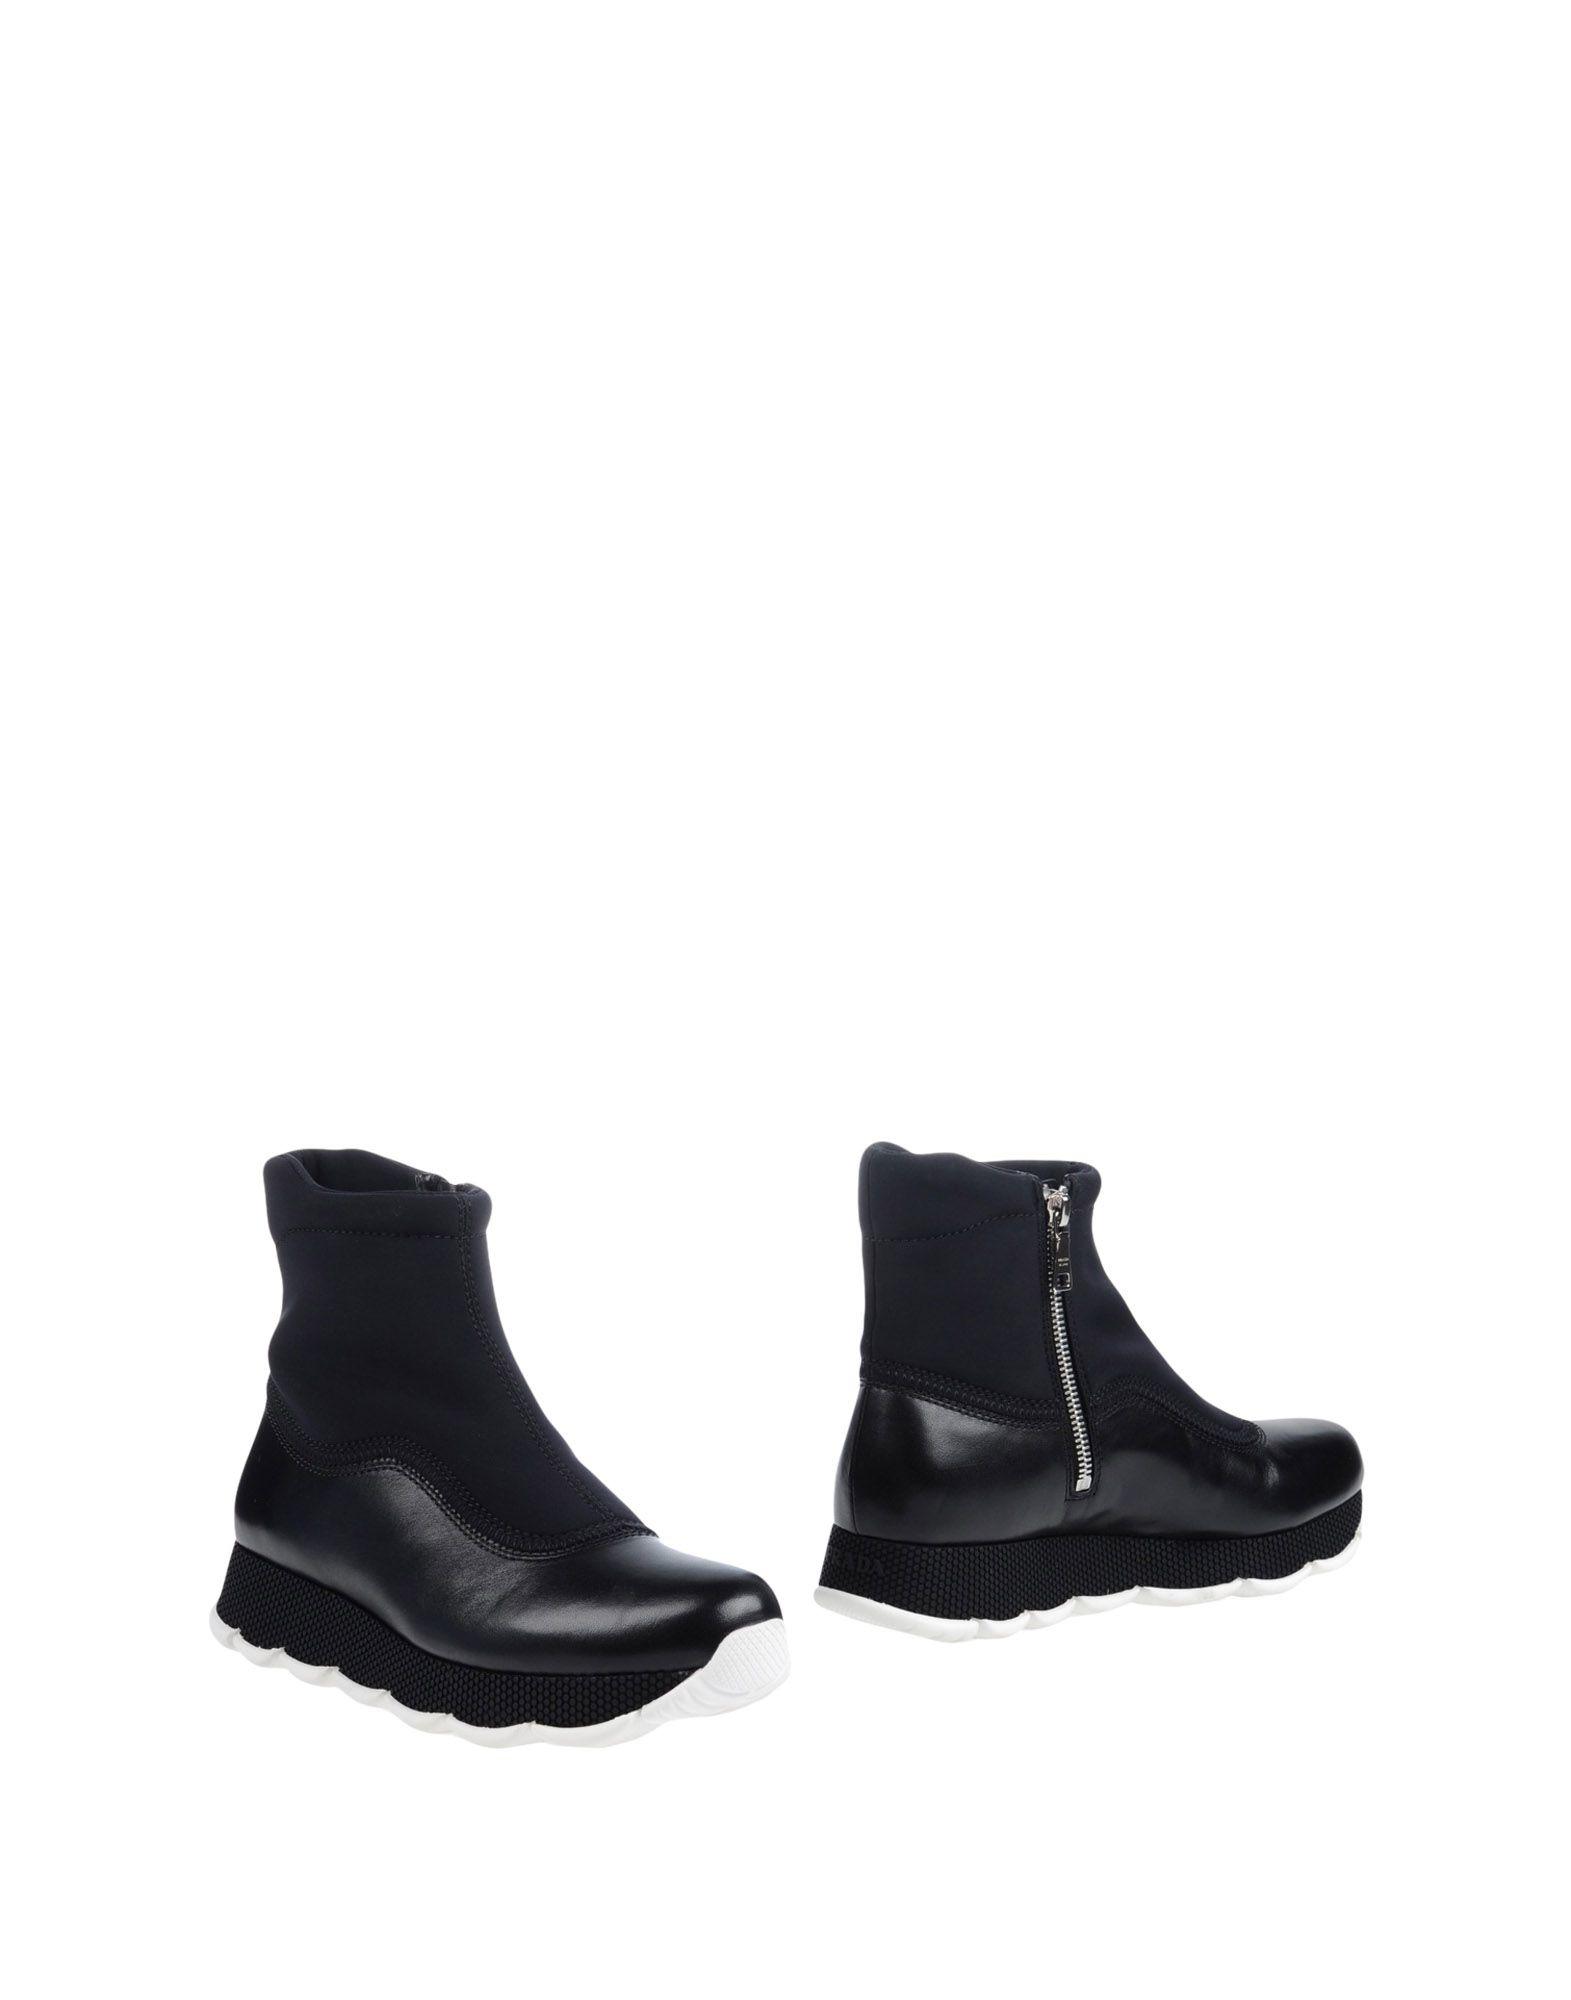 Prada 11275370XO Sport Stiefelette Damen  11275370XO Prada Beliebte Schuhe 7951b6